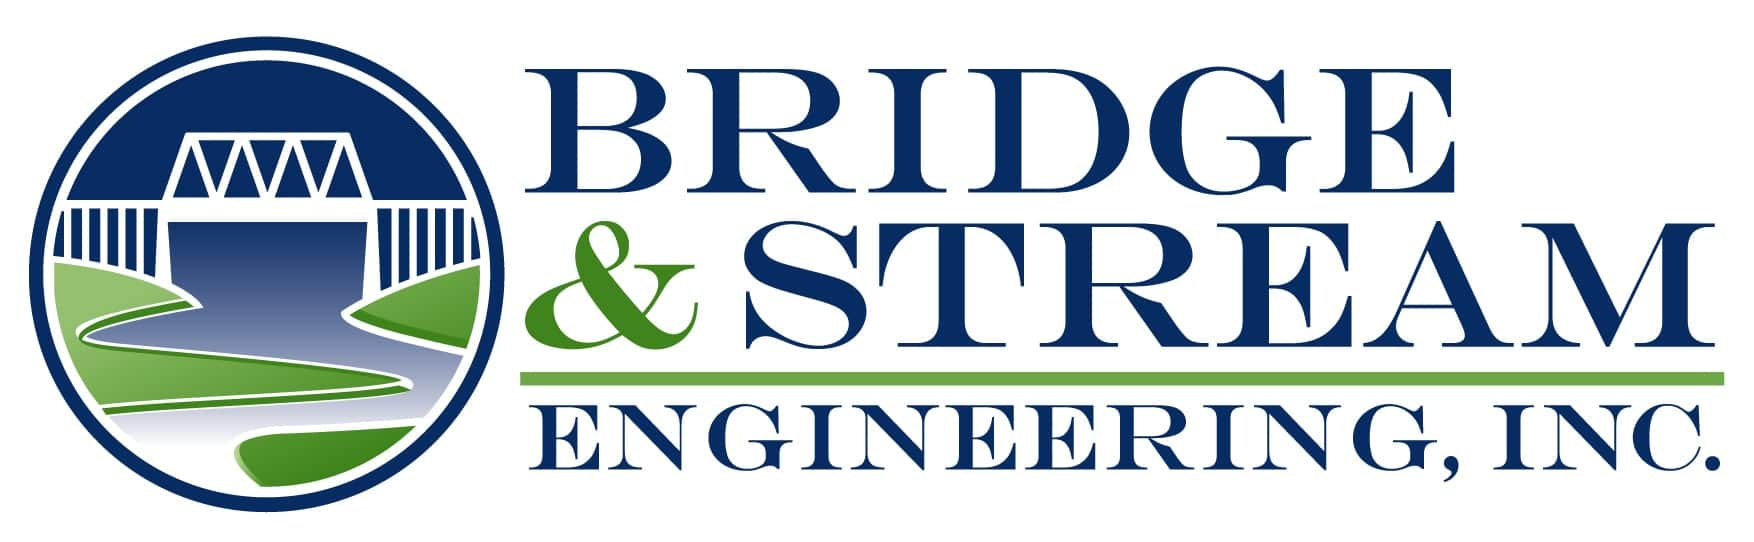 Bridge & Stream Engineering, Inc.